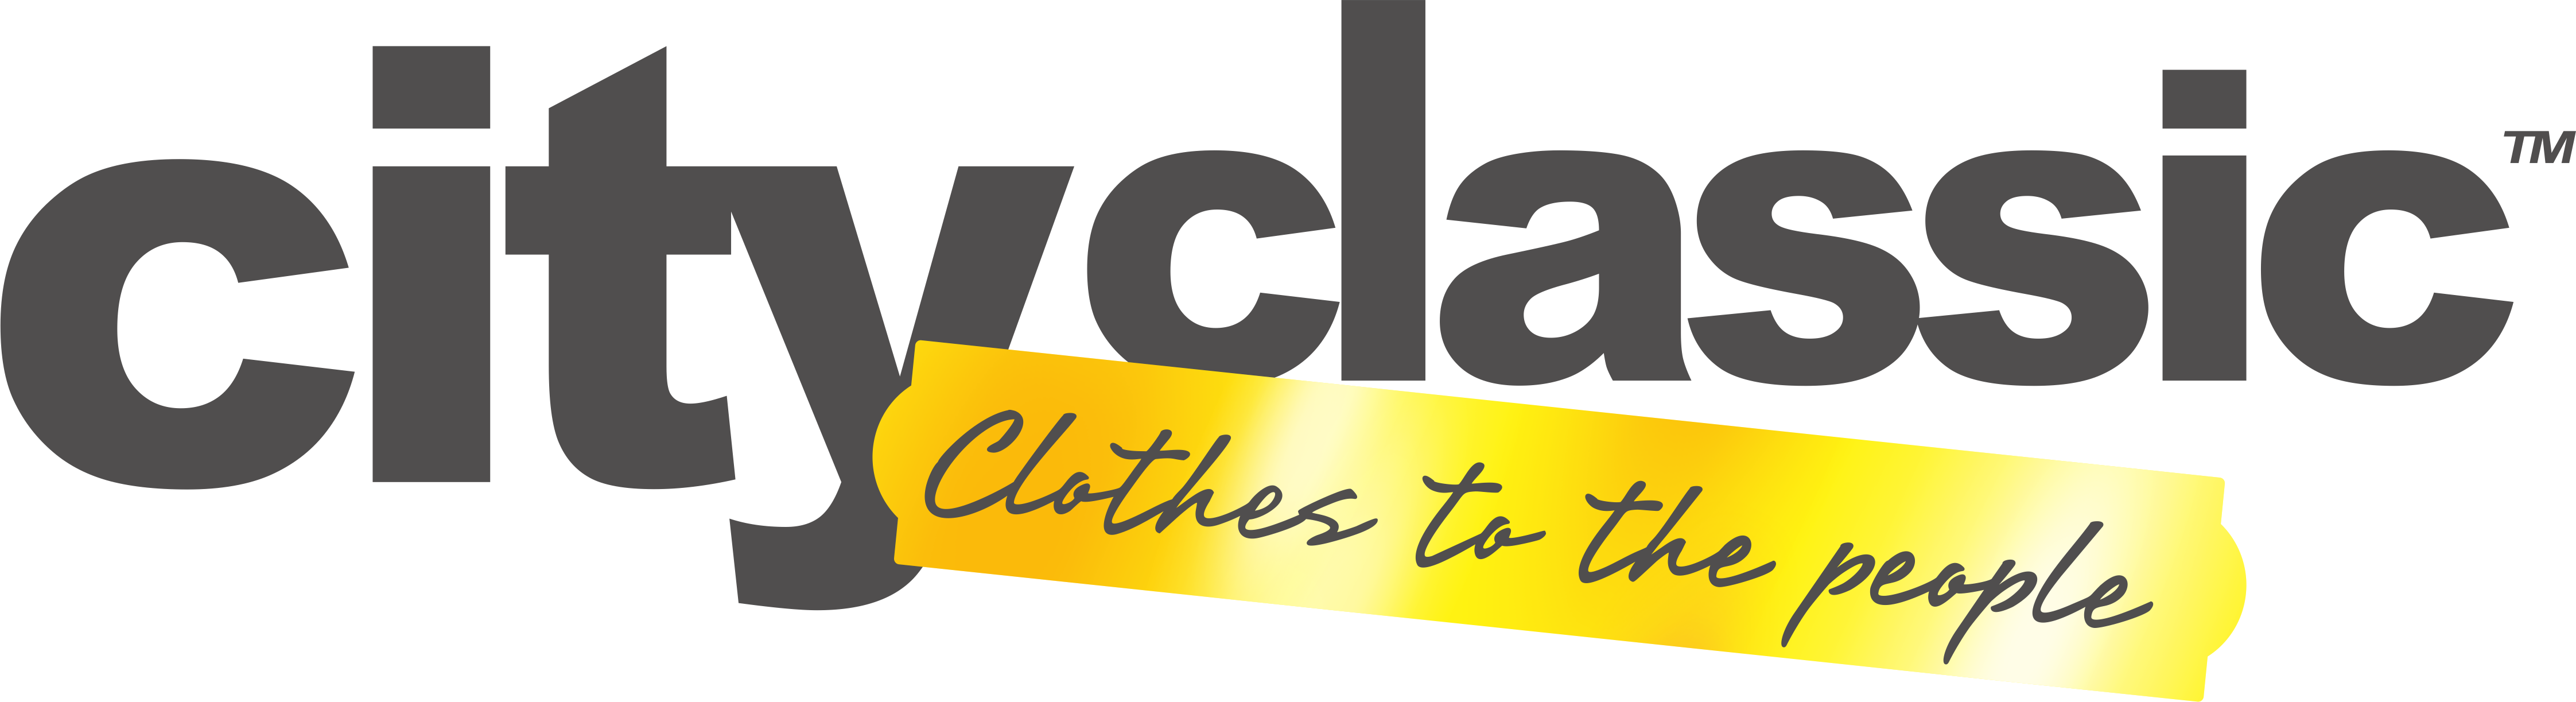 Cityclassic